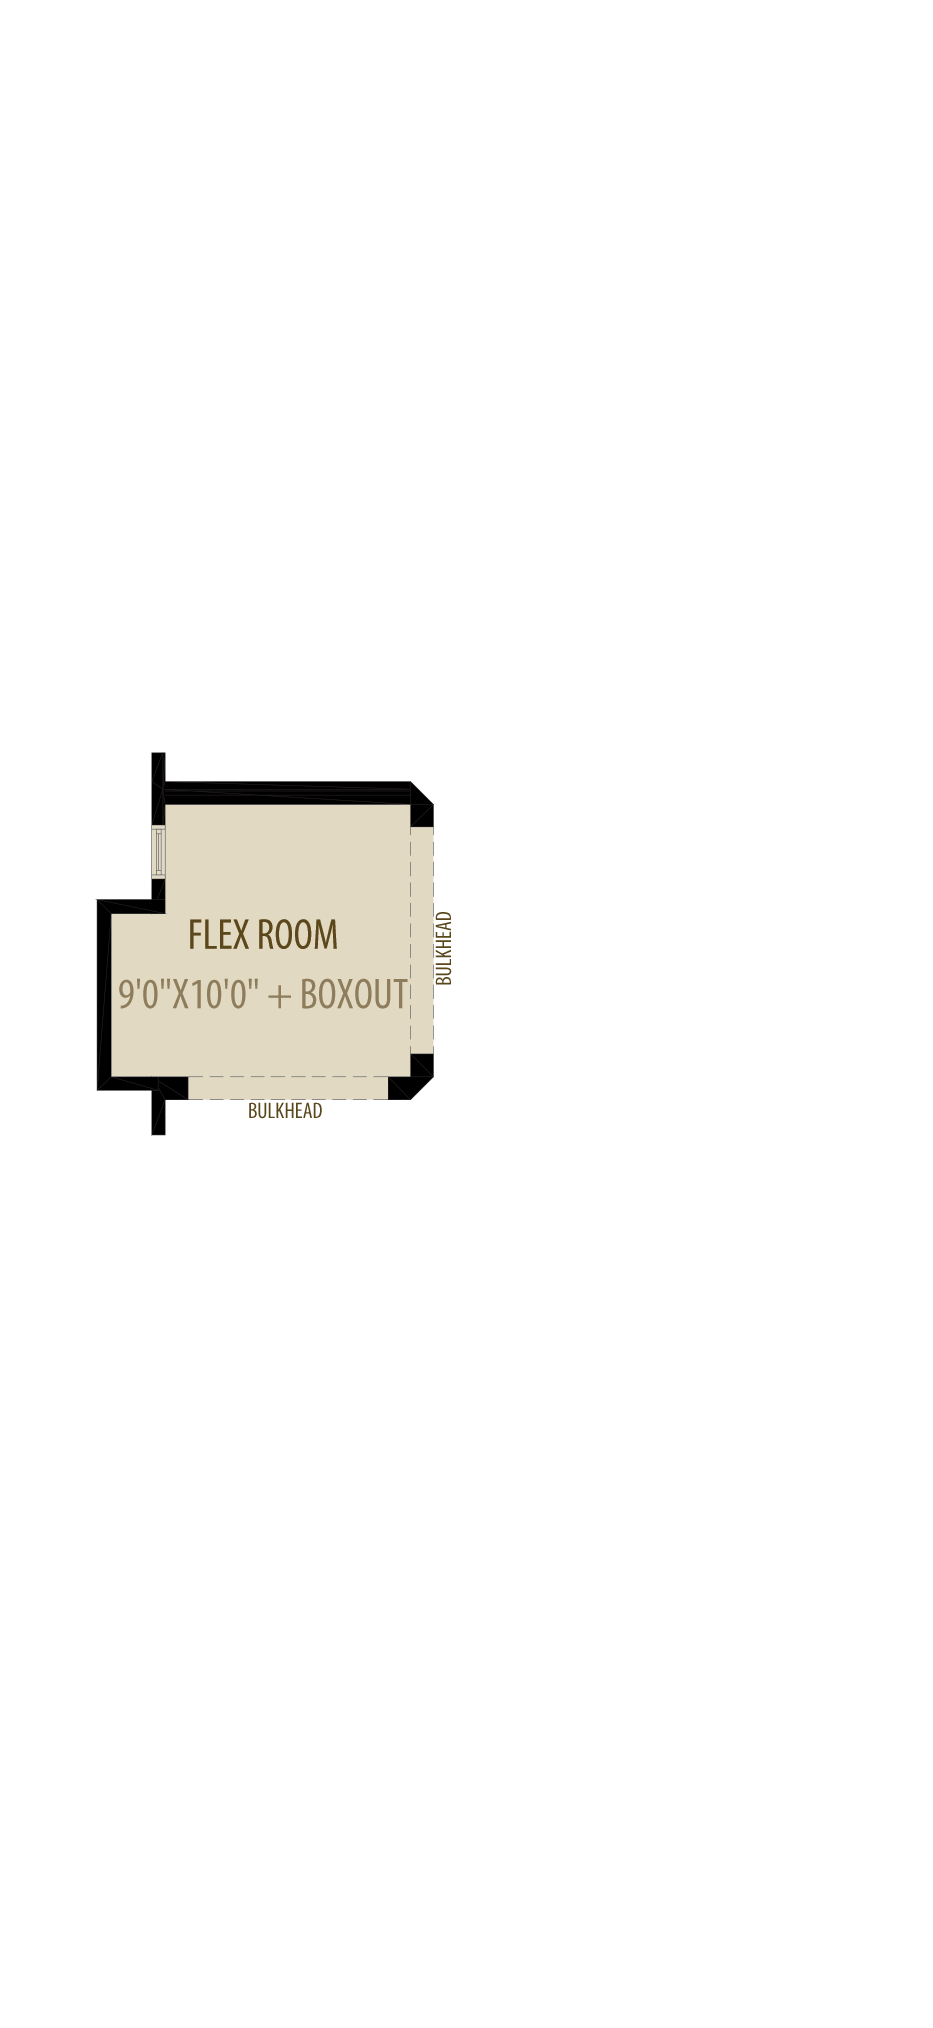 Flex Room Cantilever Adds 14Sq Ft